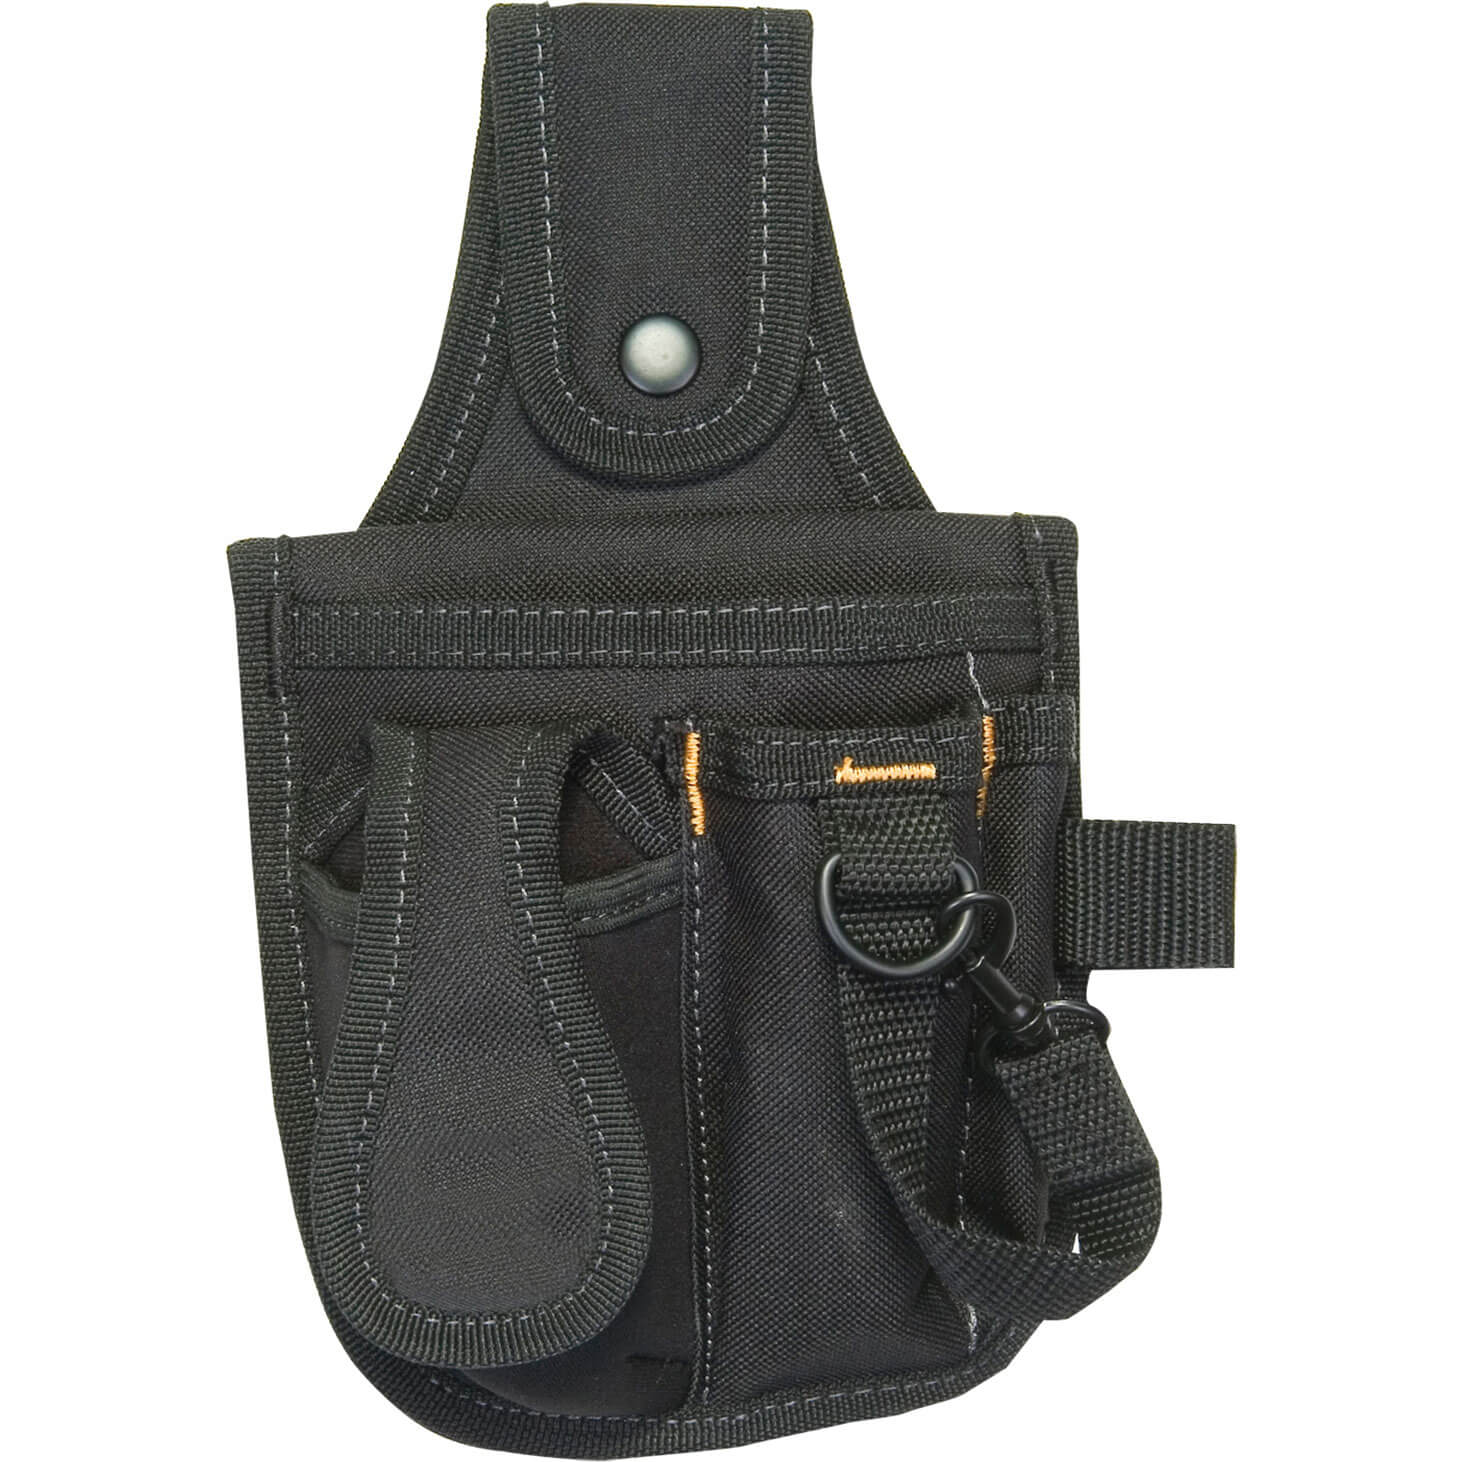 Image of Kunys 5 Pocket Tool & Phone Holder